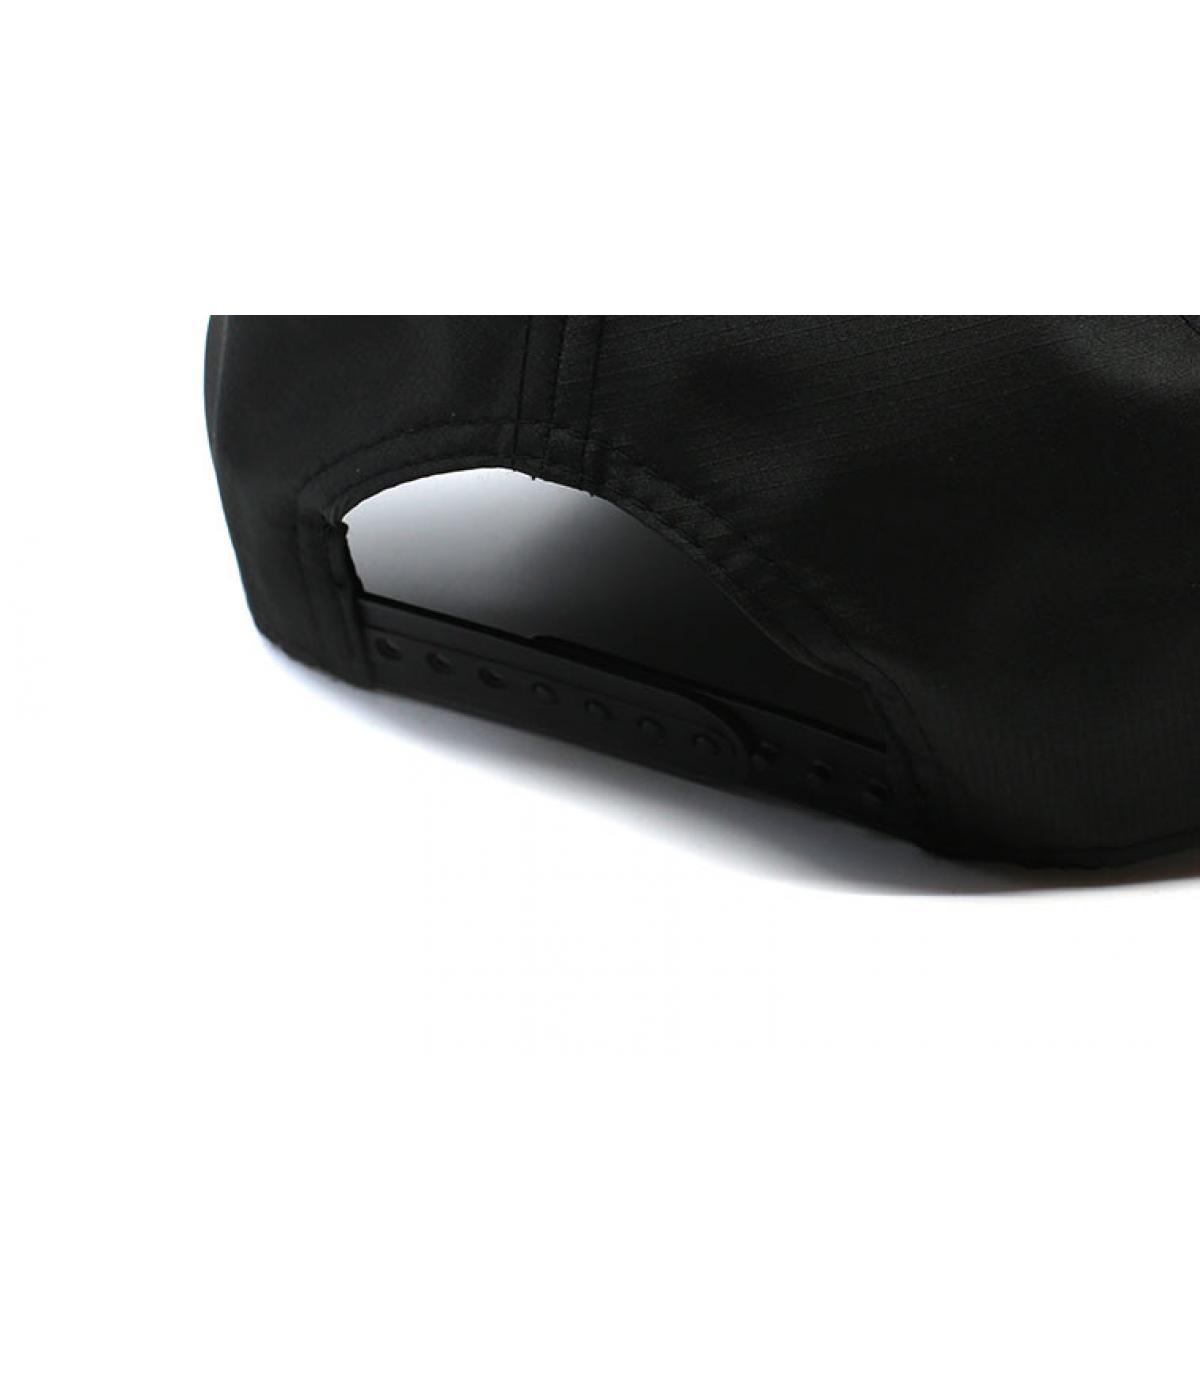 Details Ripstop NY Aframe black maroon - afbeeling 5